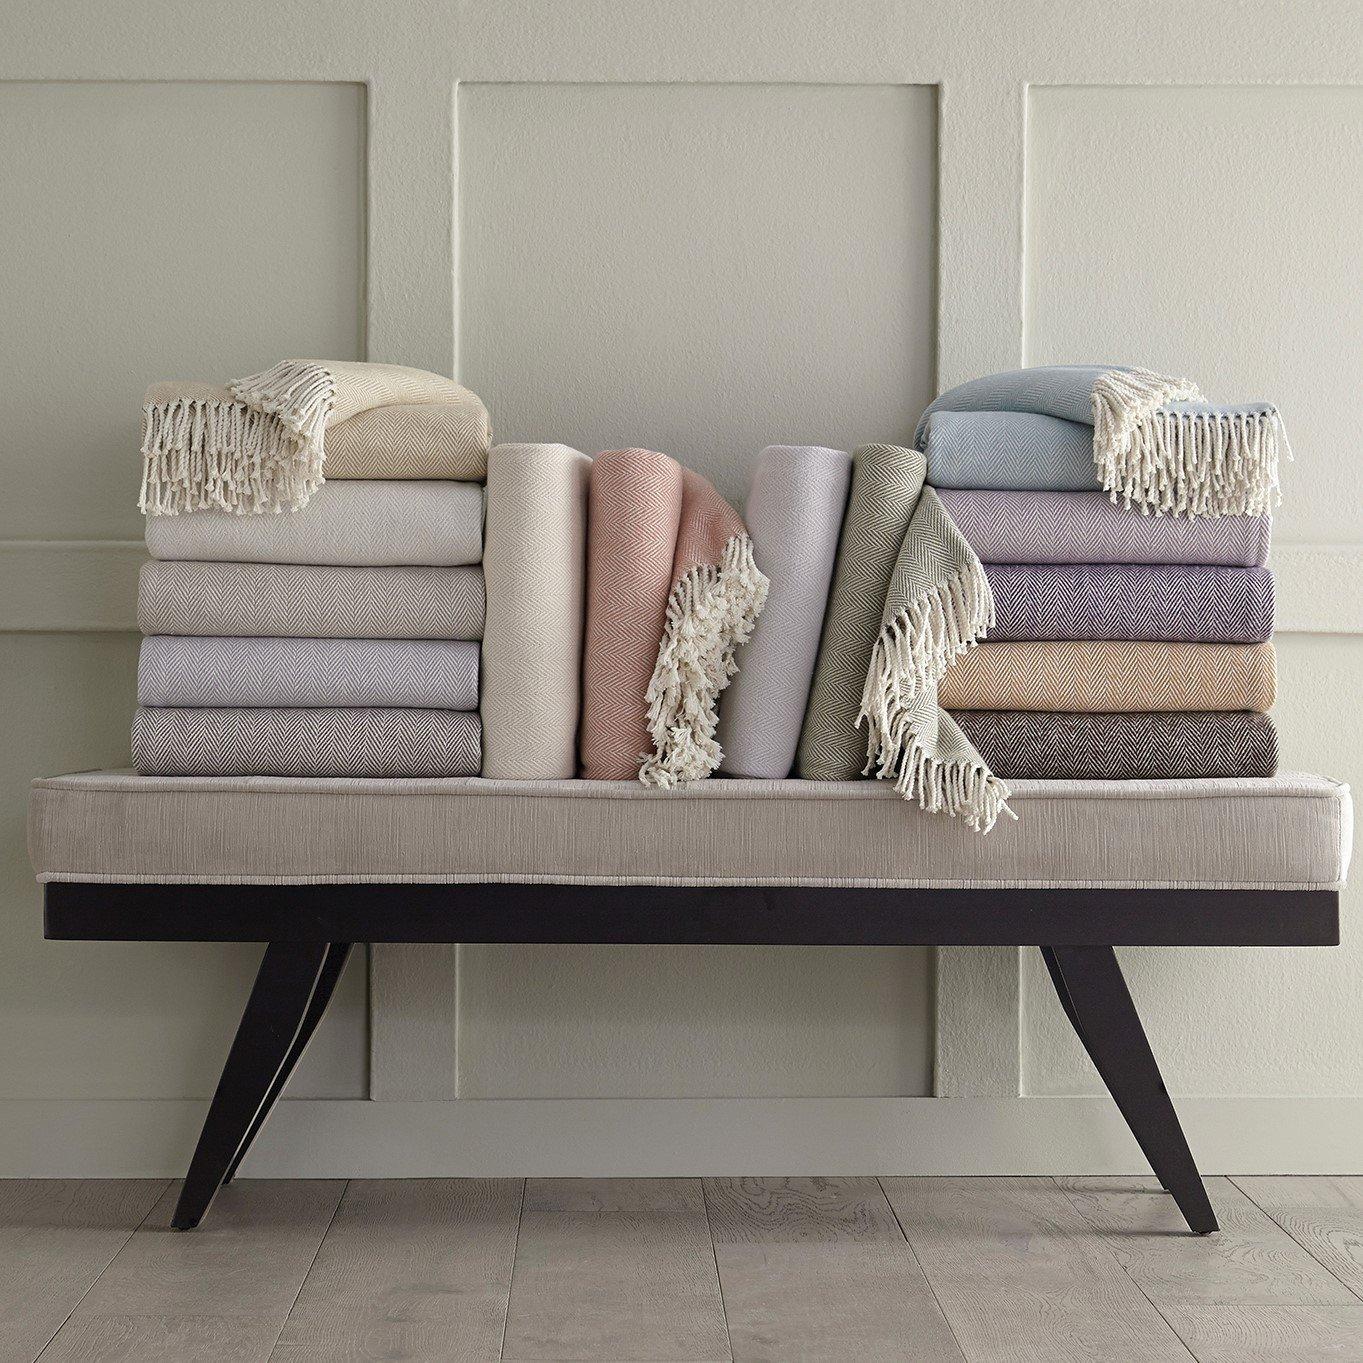 Decorative Pillows Throws Hildreth S Home Goods